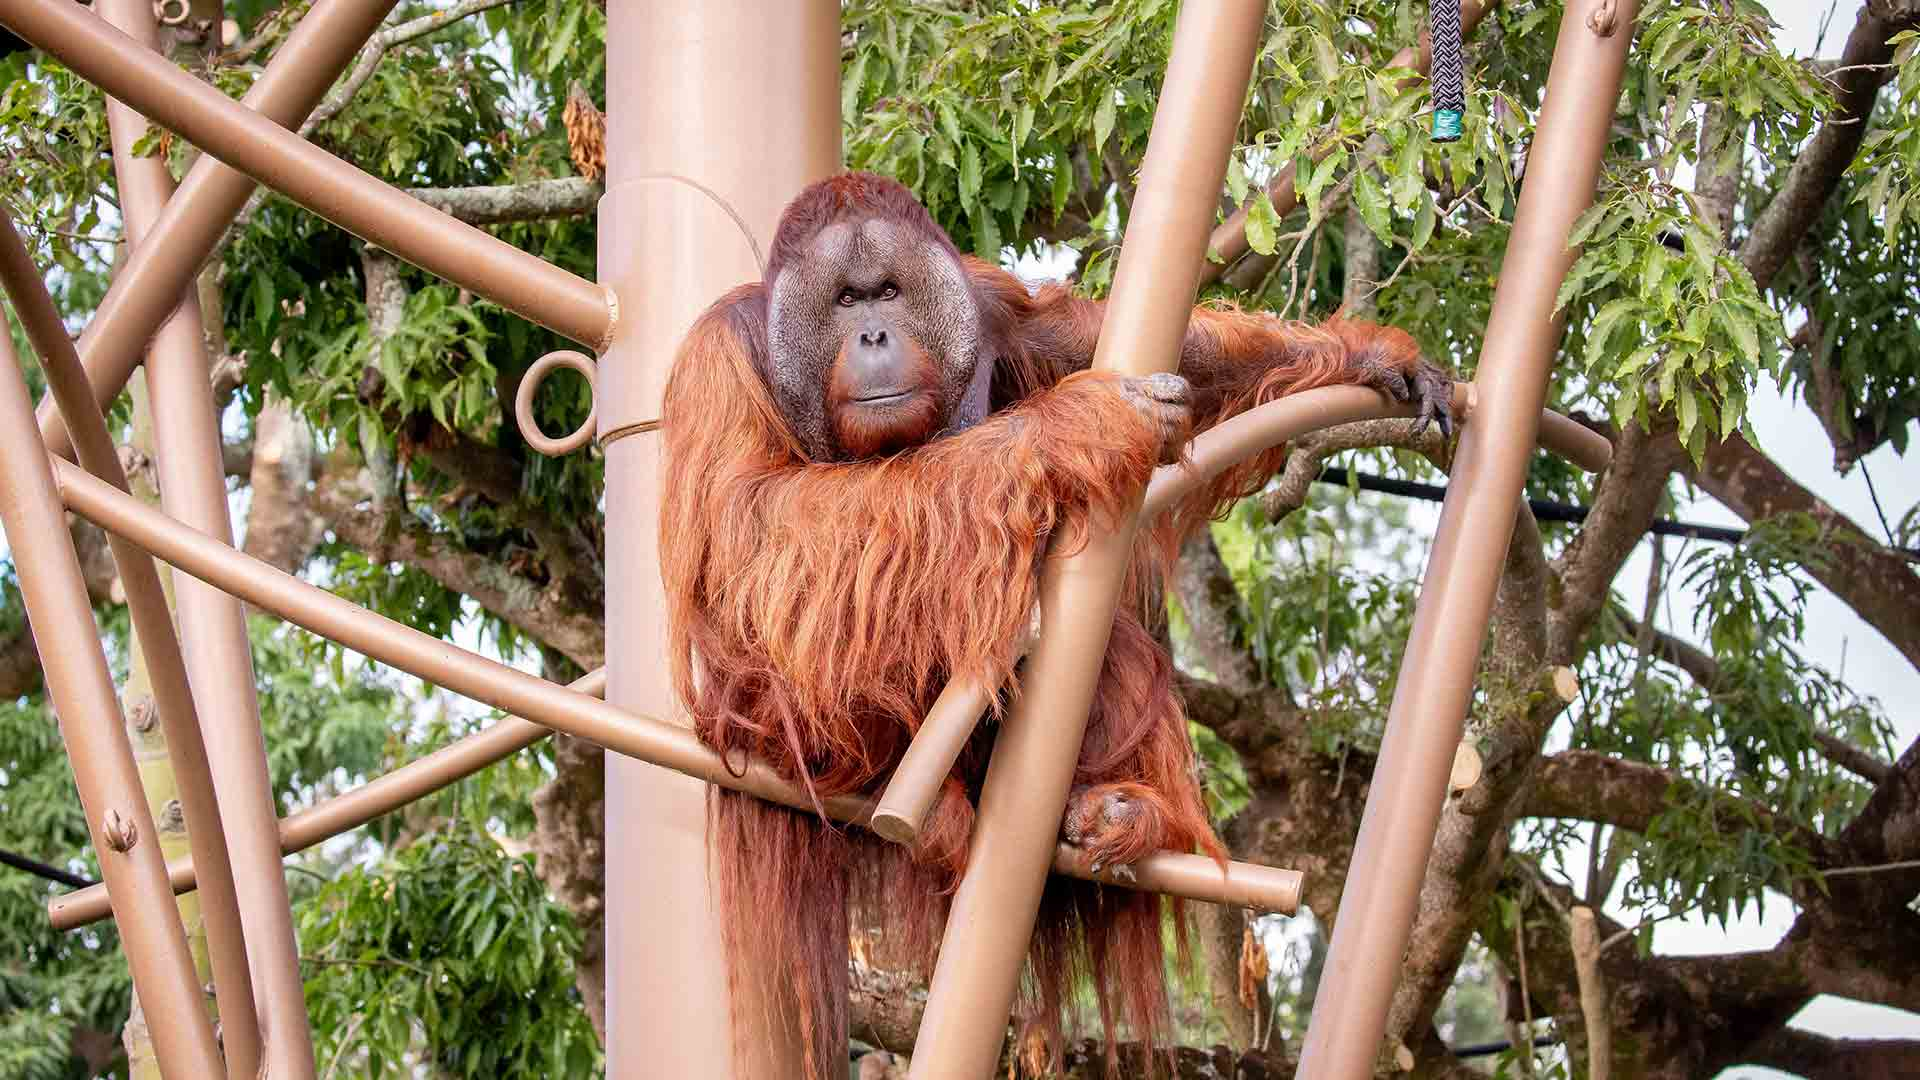 https://rfacdn.nz/zoo/assets/media/orangutan-move-gallery-2.jpg